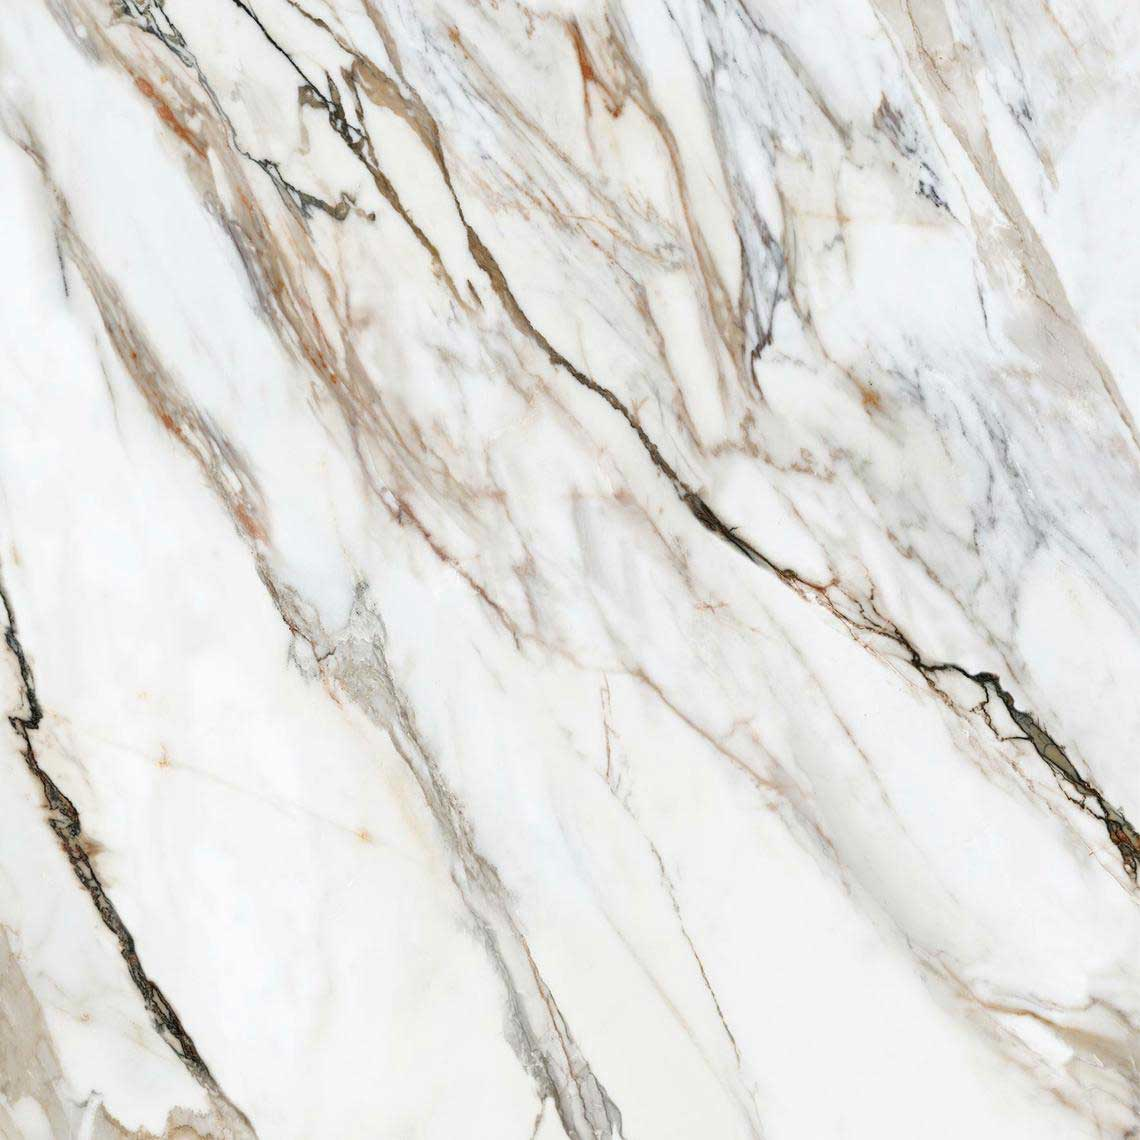 Calacatta-Fortuna-marble-porcelain-tile-75-x-75